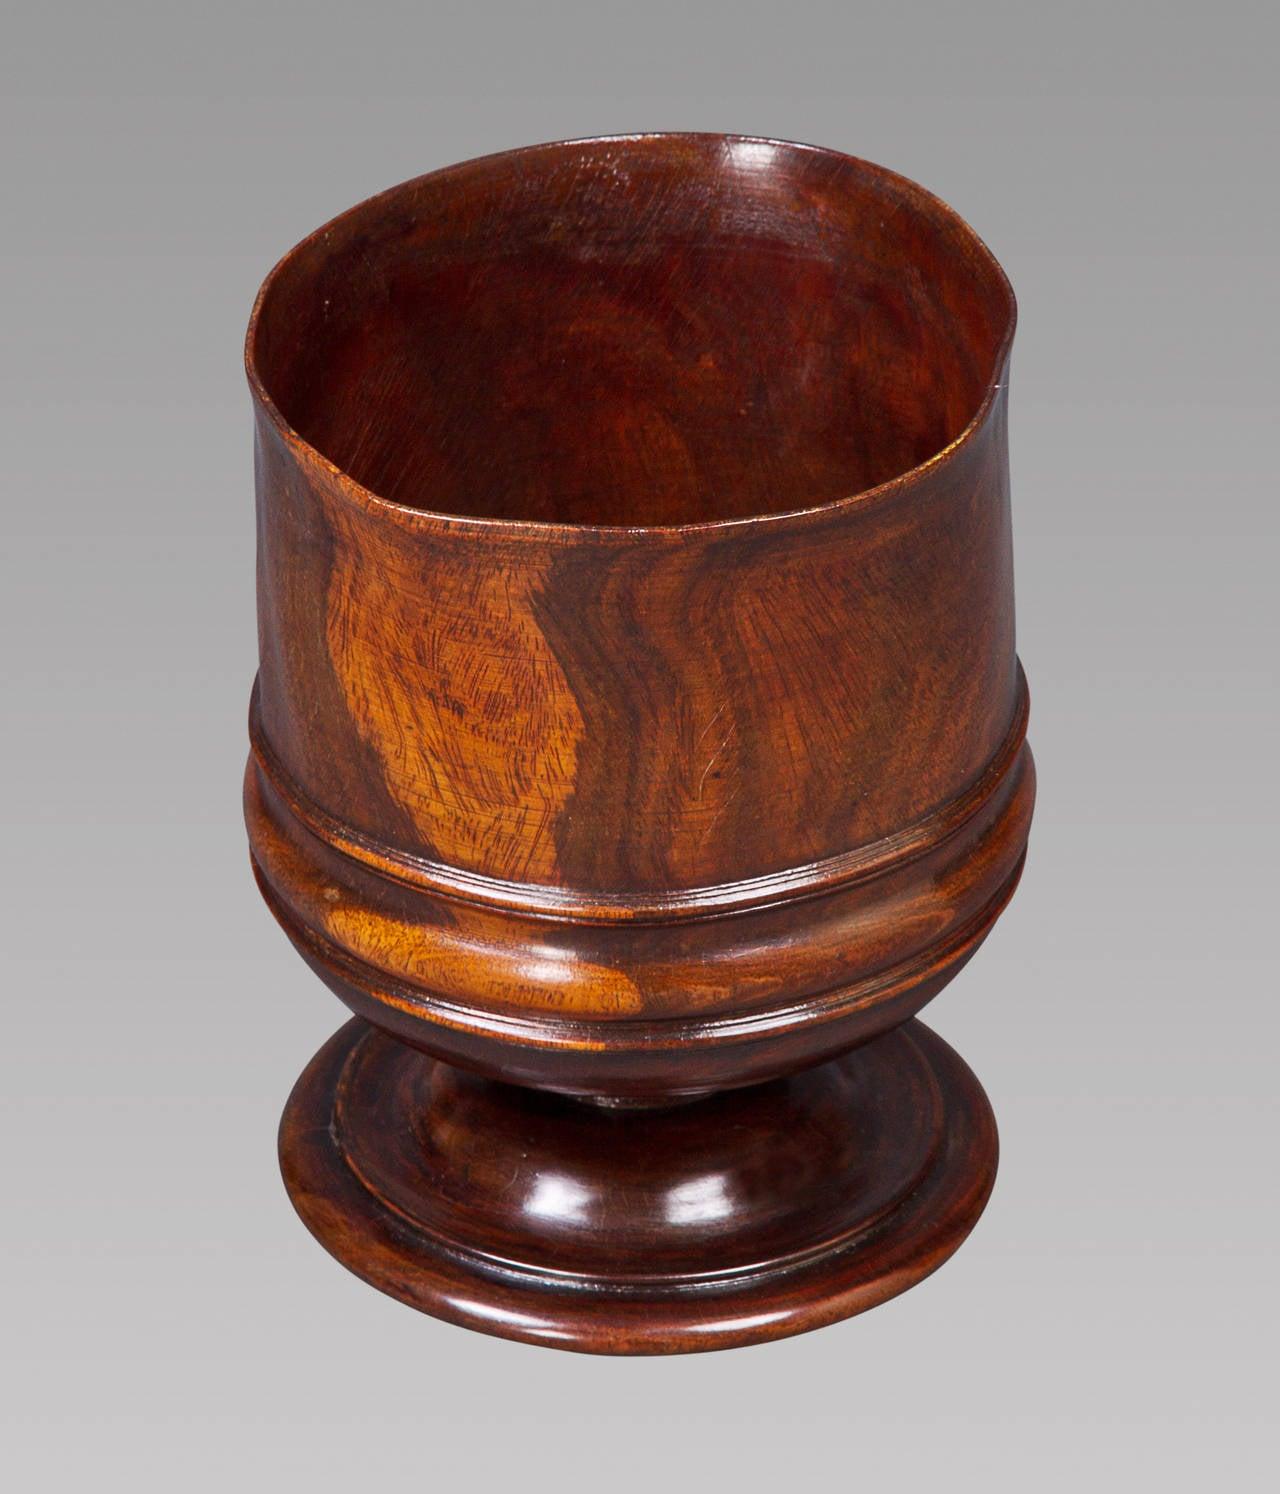 Charles II Turned Lignum Vitae Wassail Bowl 3